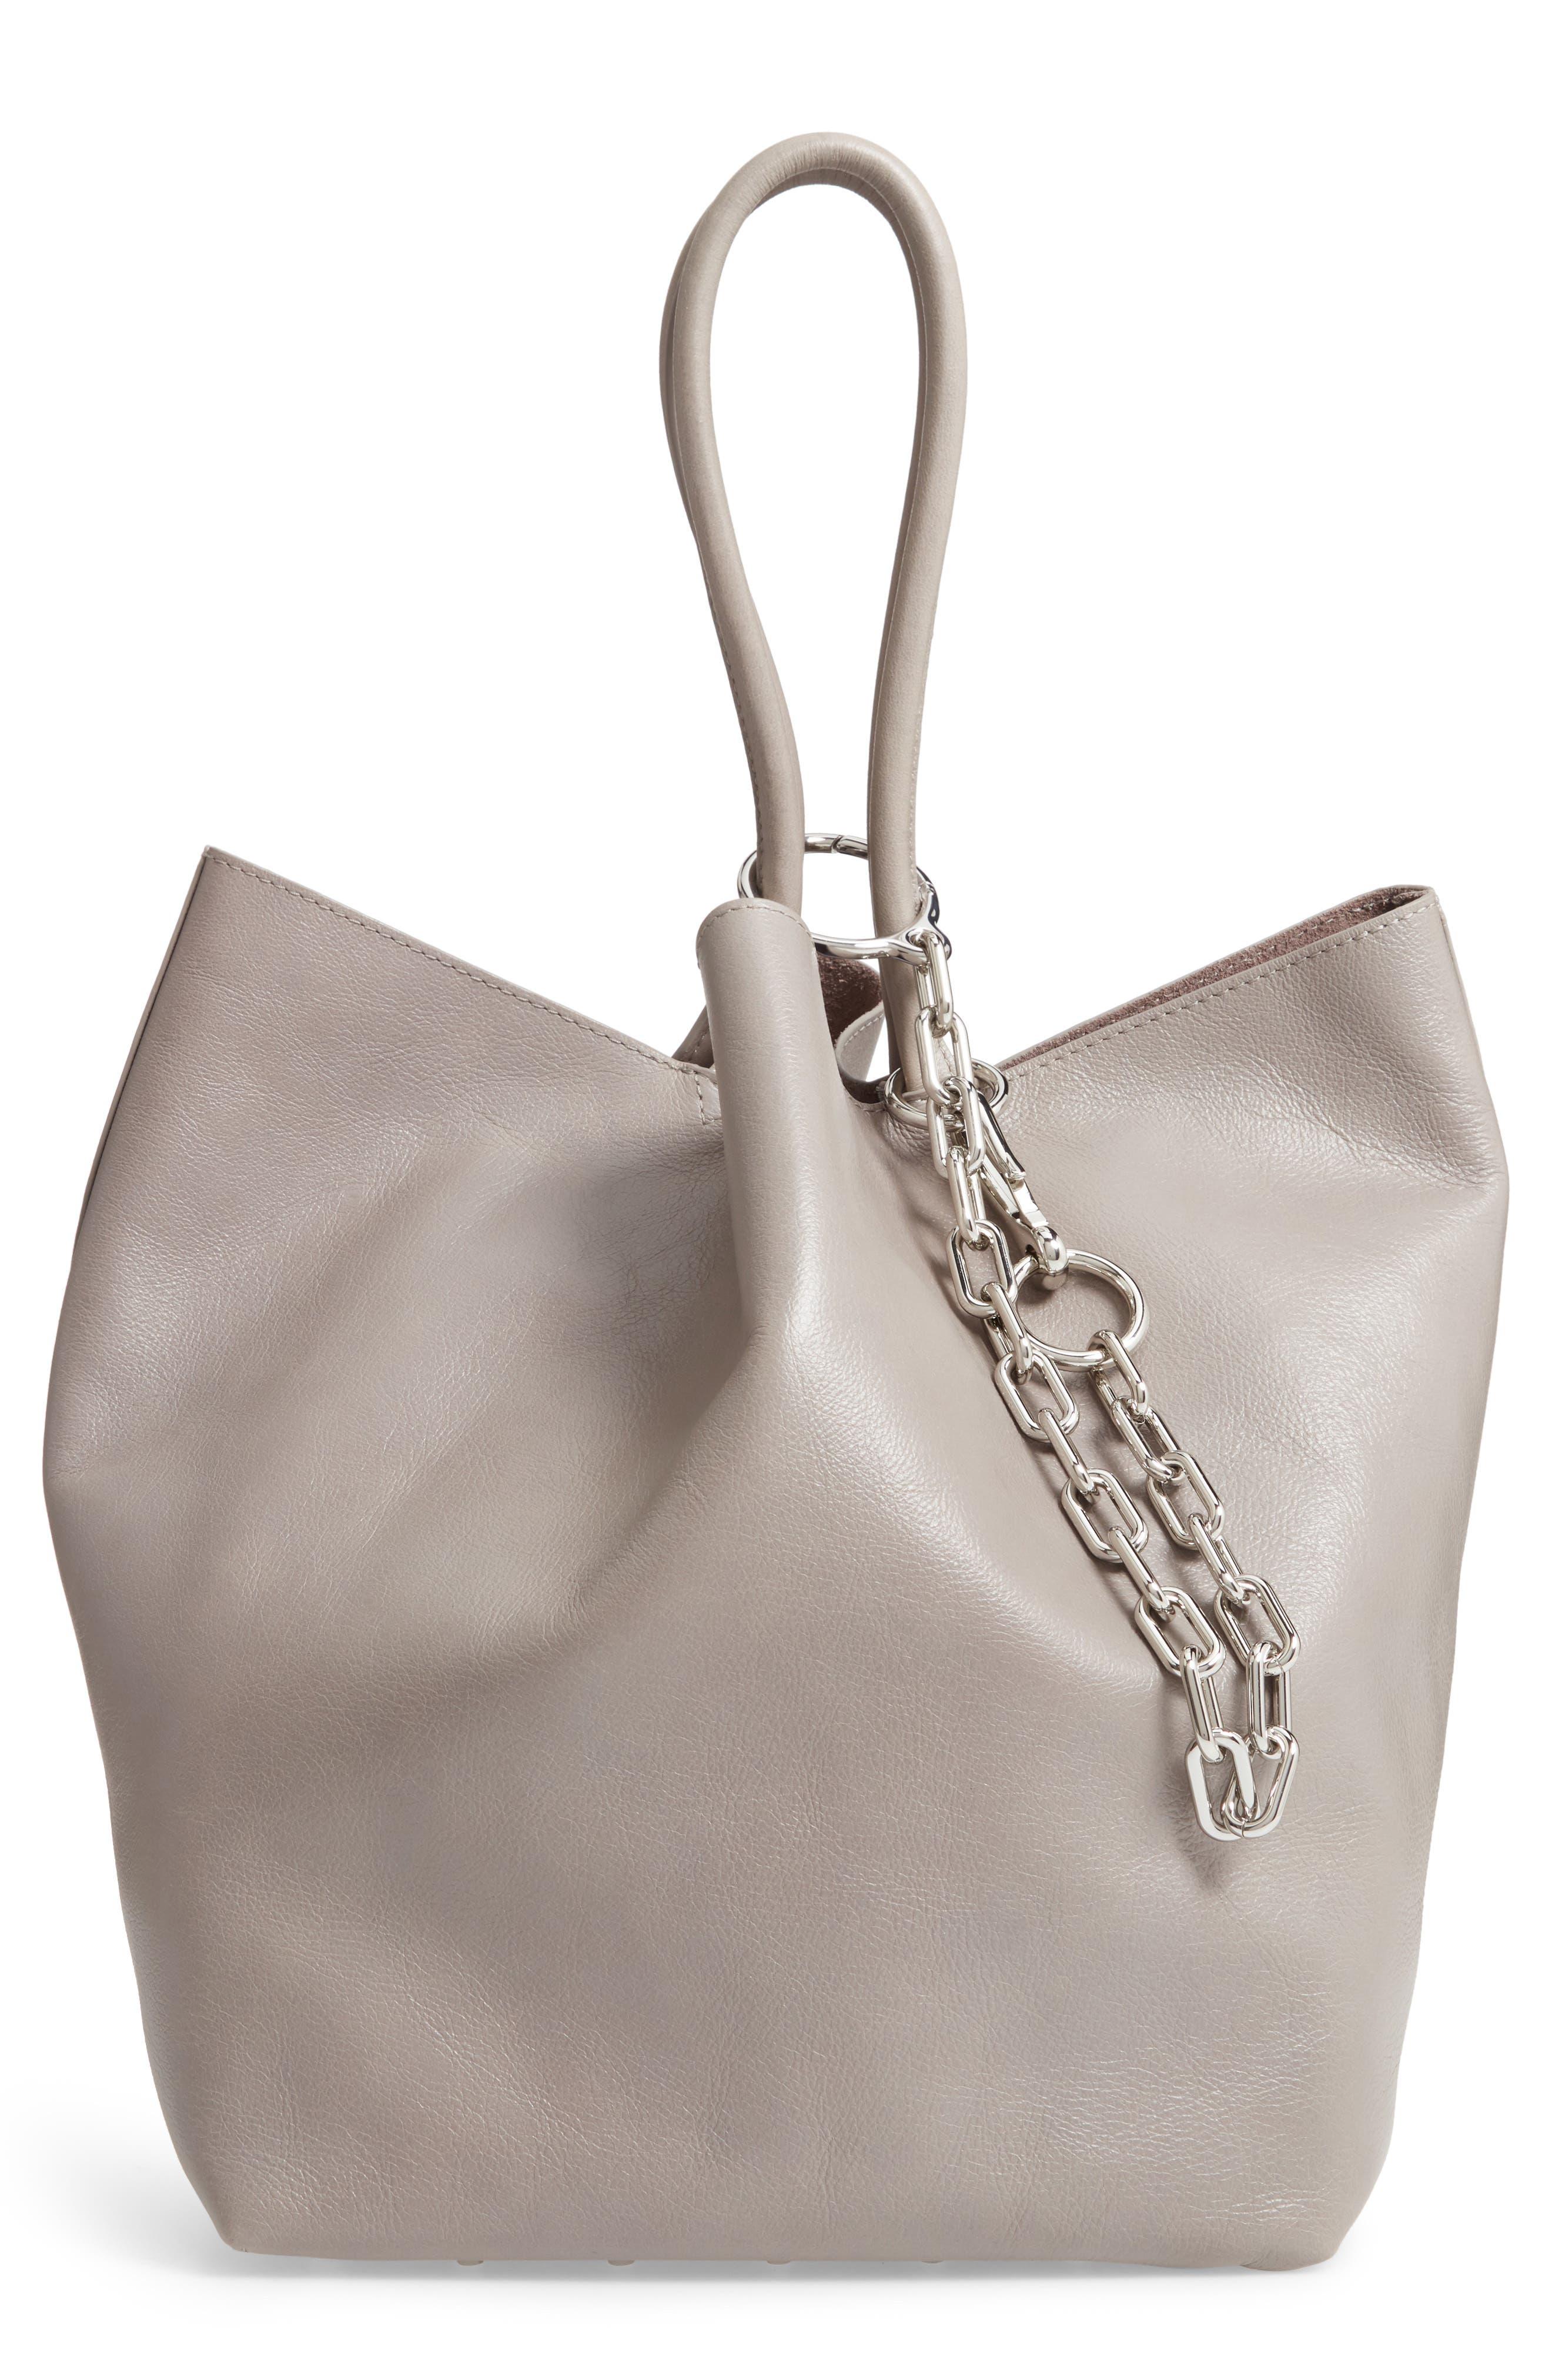 Roxy Large Leather Tote Bag,                         Main,                         color, SLATE